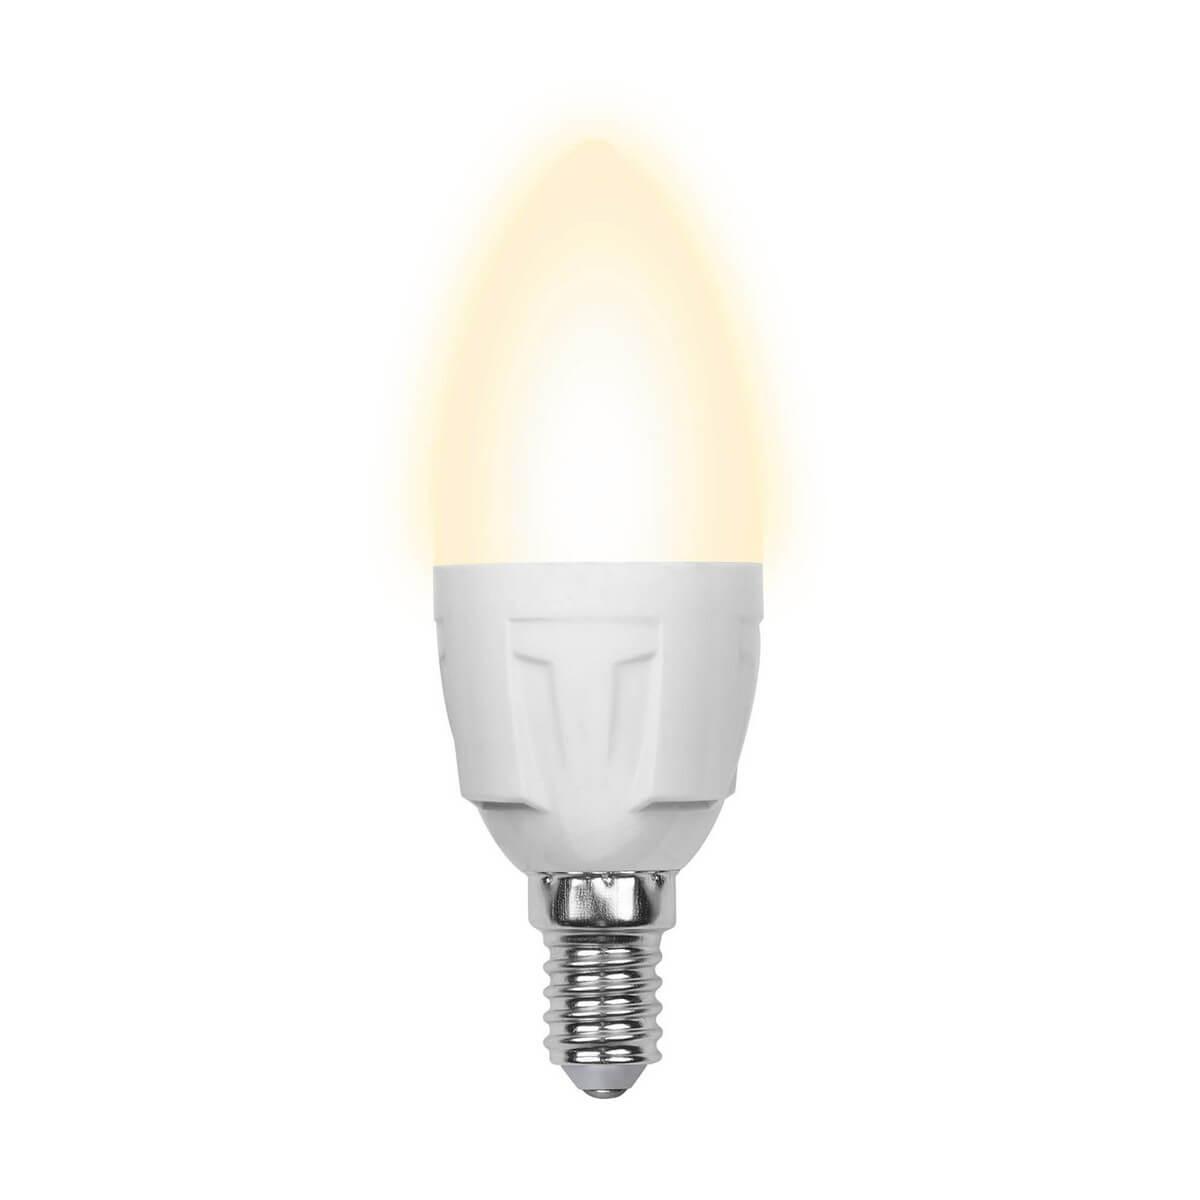 Лампа светодиодная (10214) E14 6W 3000K матовая LED-C37-6W/WW/E14/FR/O цена в Москве и Питере